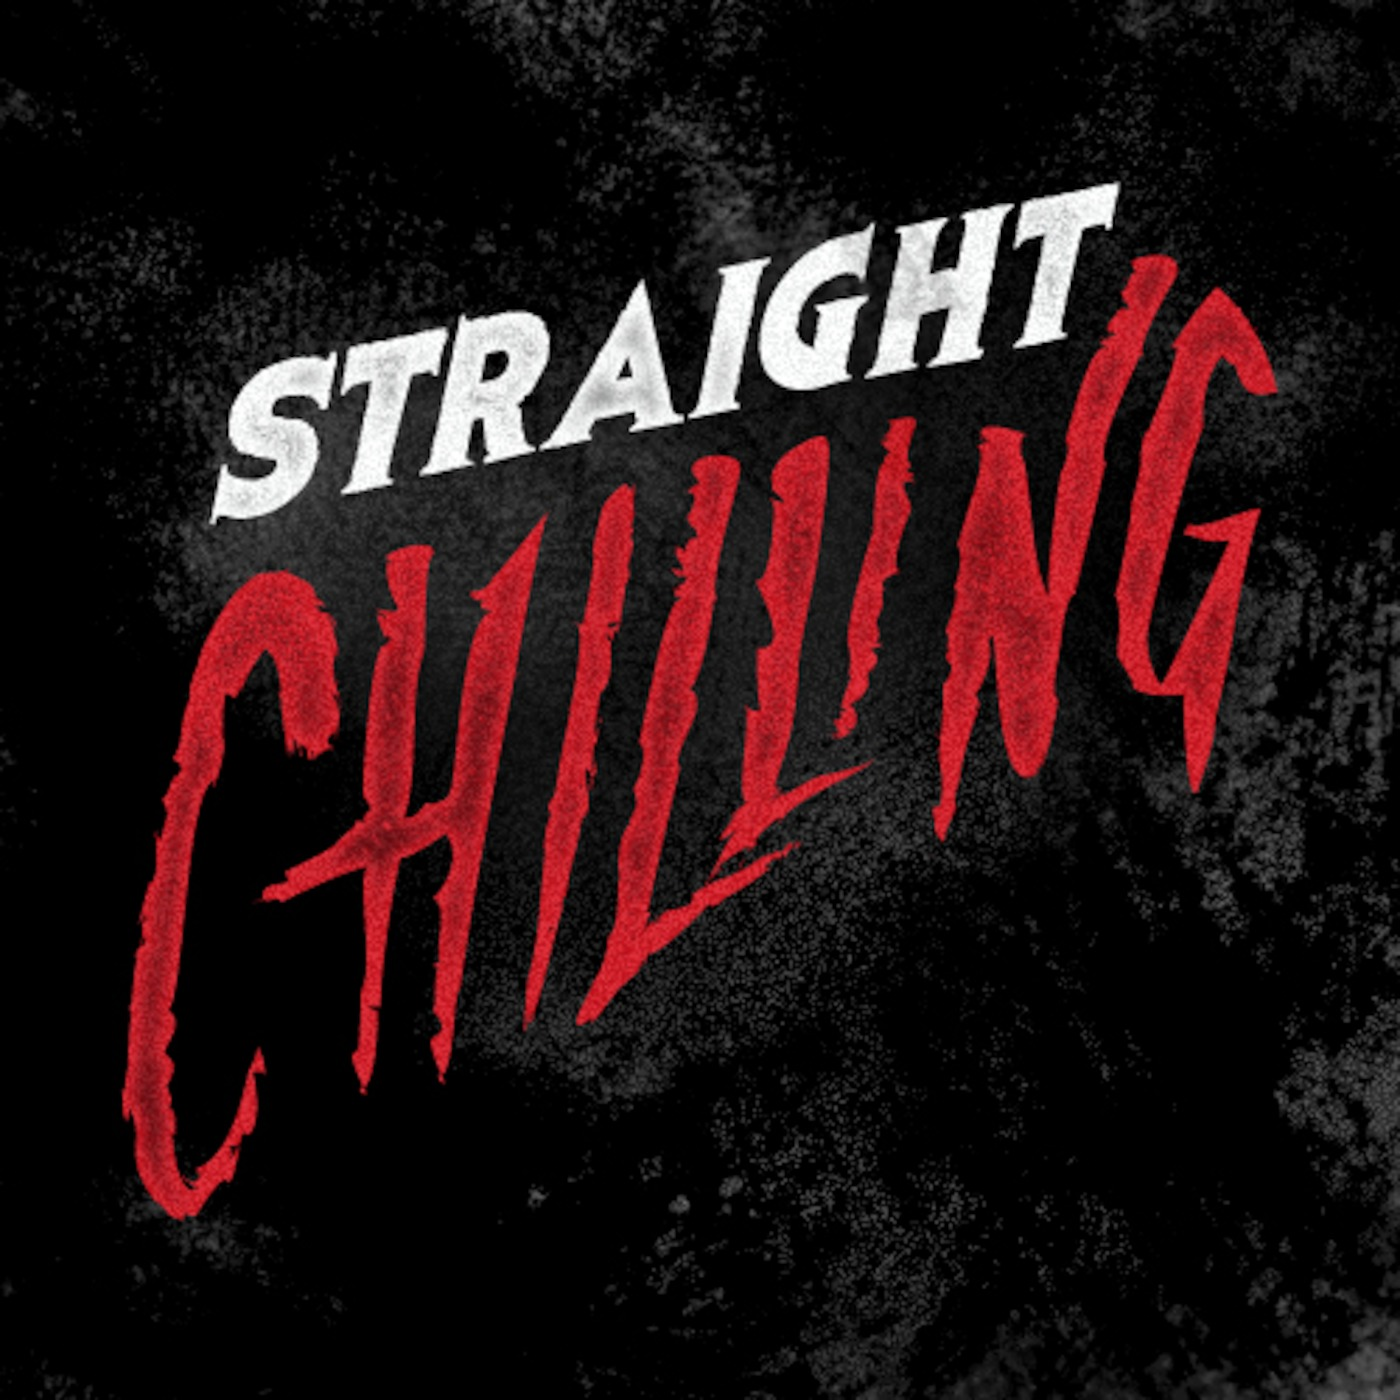 Straight Chilling